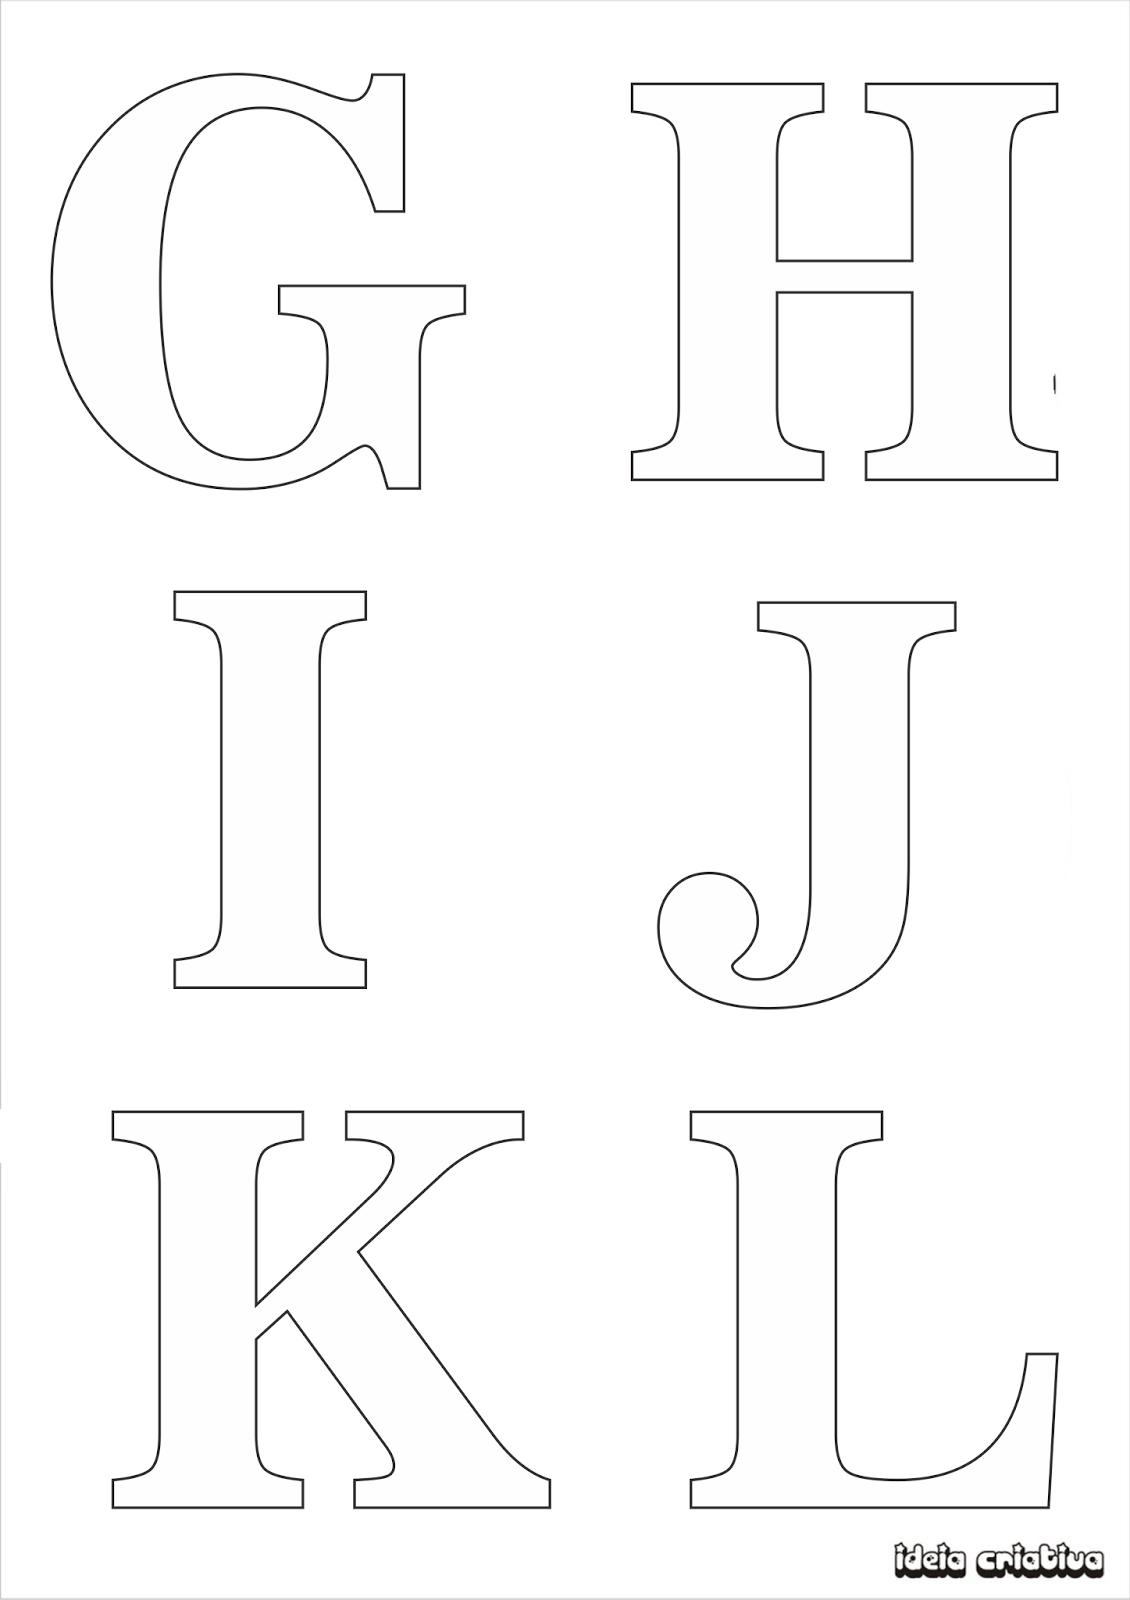 Molde de letras para imprimir alfabeto completo fonte vazada molde de letras para imprimir alfabeto completo fonte vazada alphabet stencilscutting filesstencilingchristeningcroquishand embroideryquillingfree spiritdancerdesigns Images